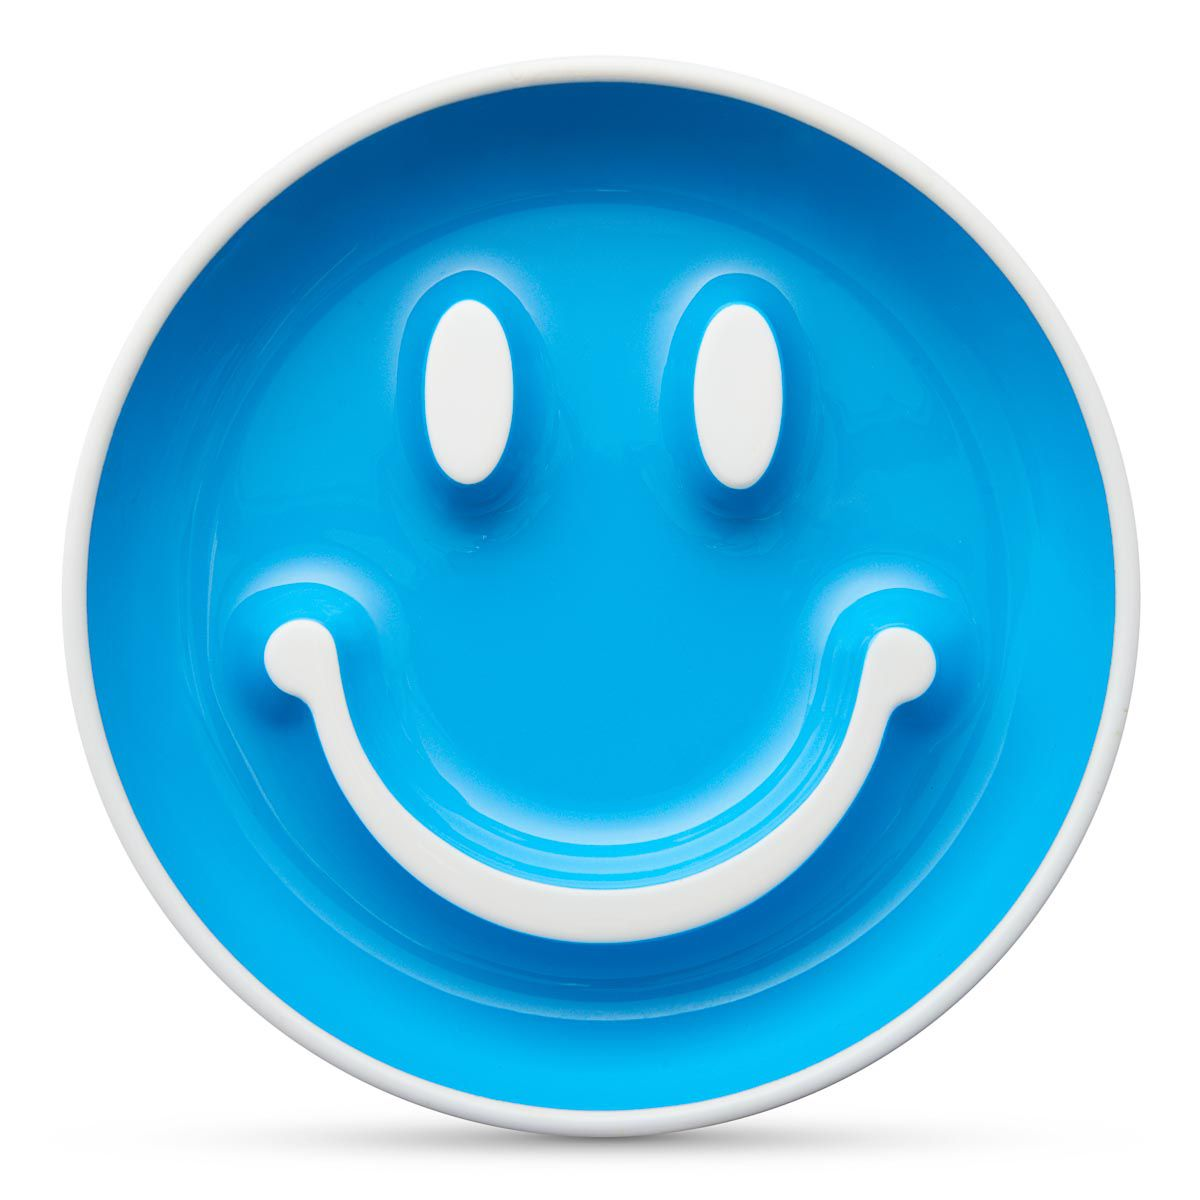 Prato Smile com Ventosa Azul - Munchkin